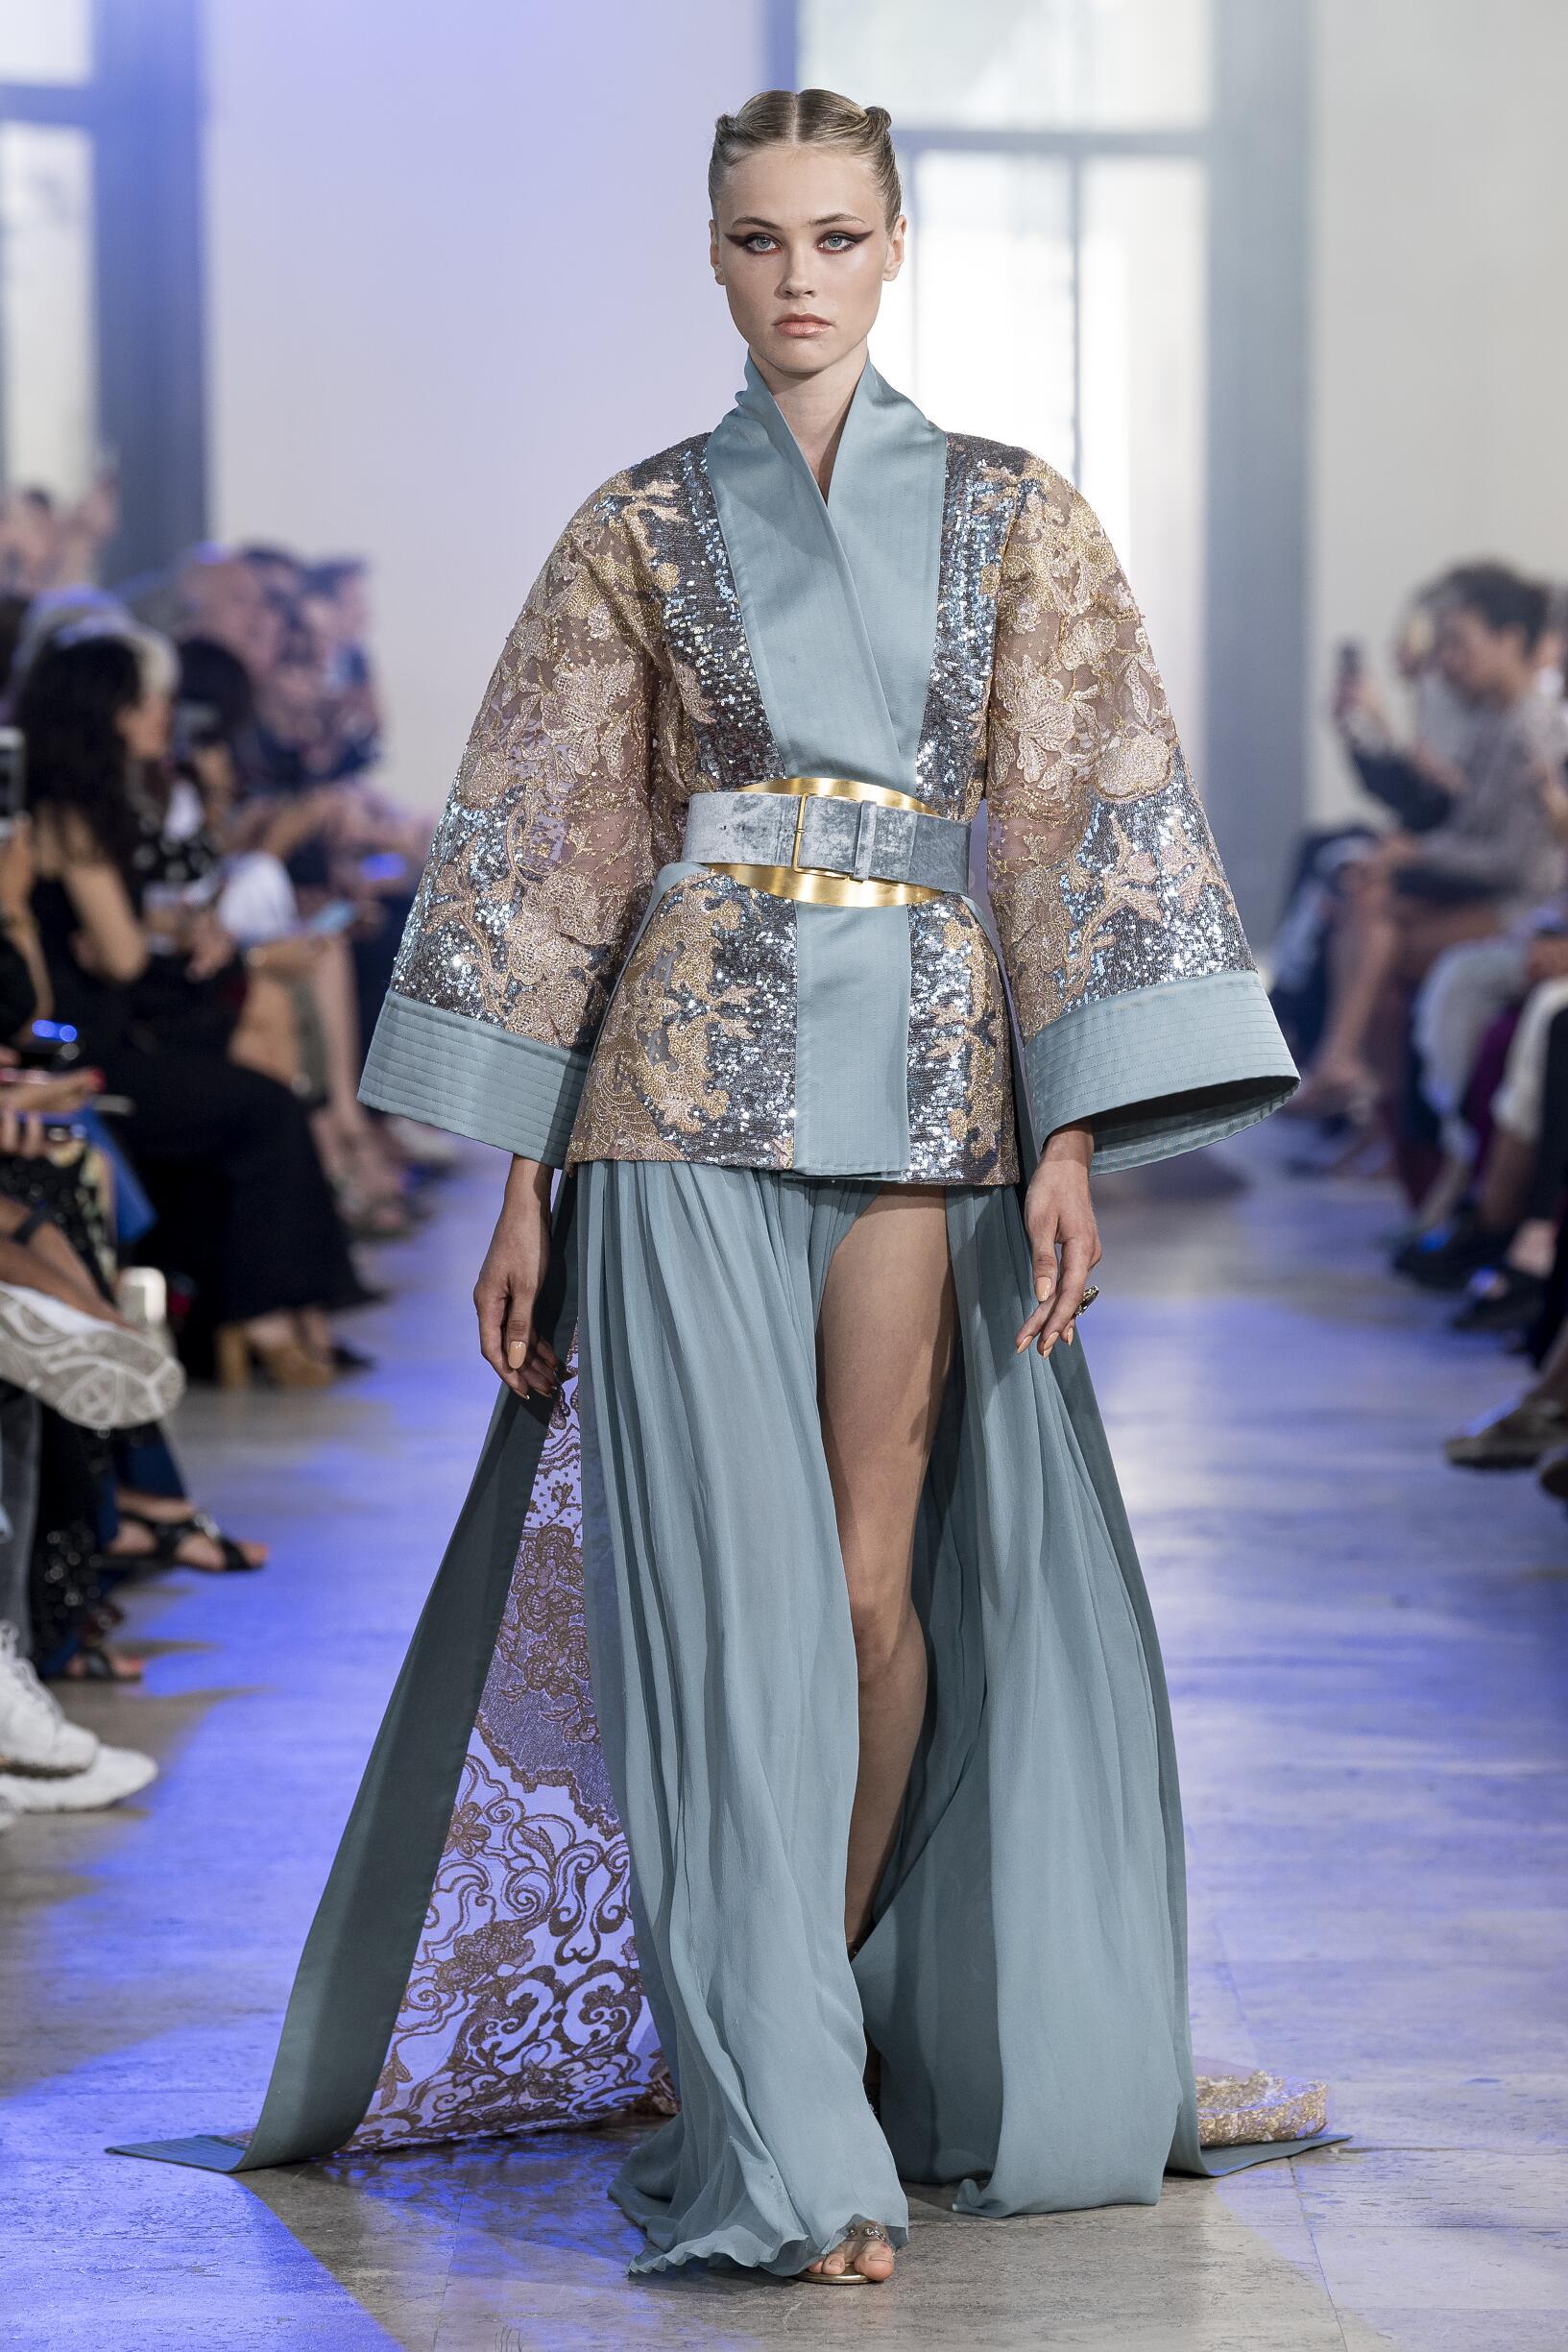 2019-20 Elie Saab Haute Couture Catwalk